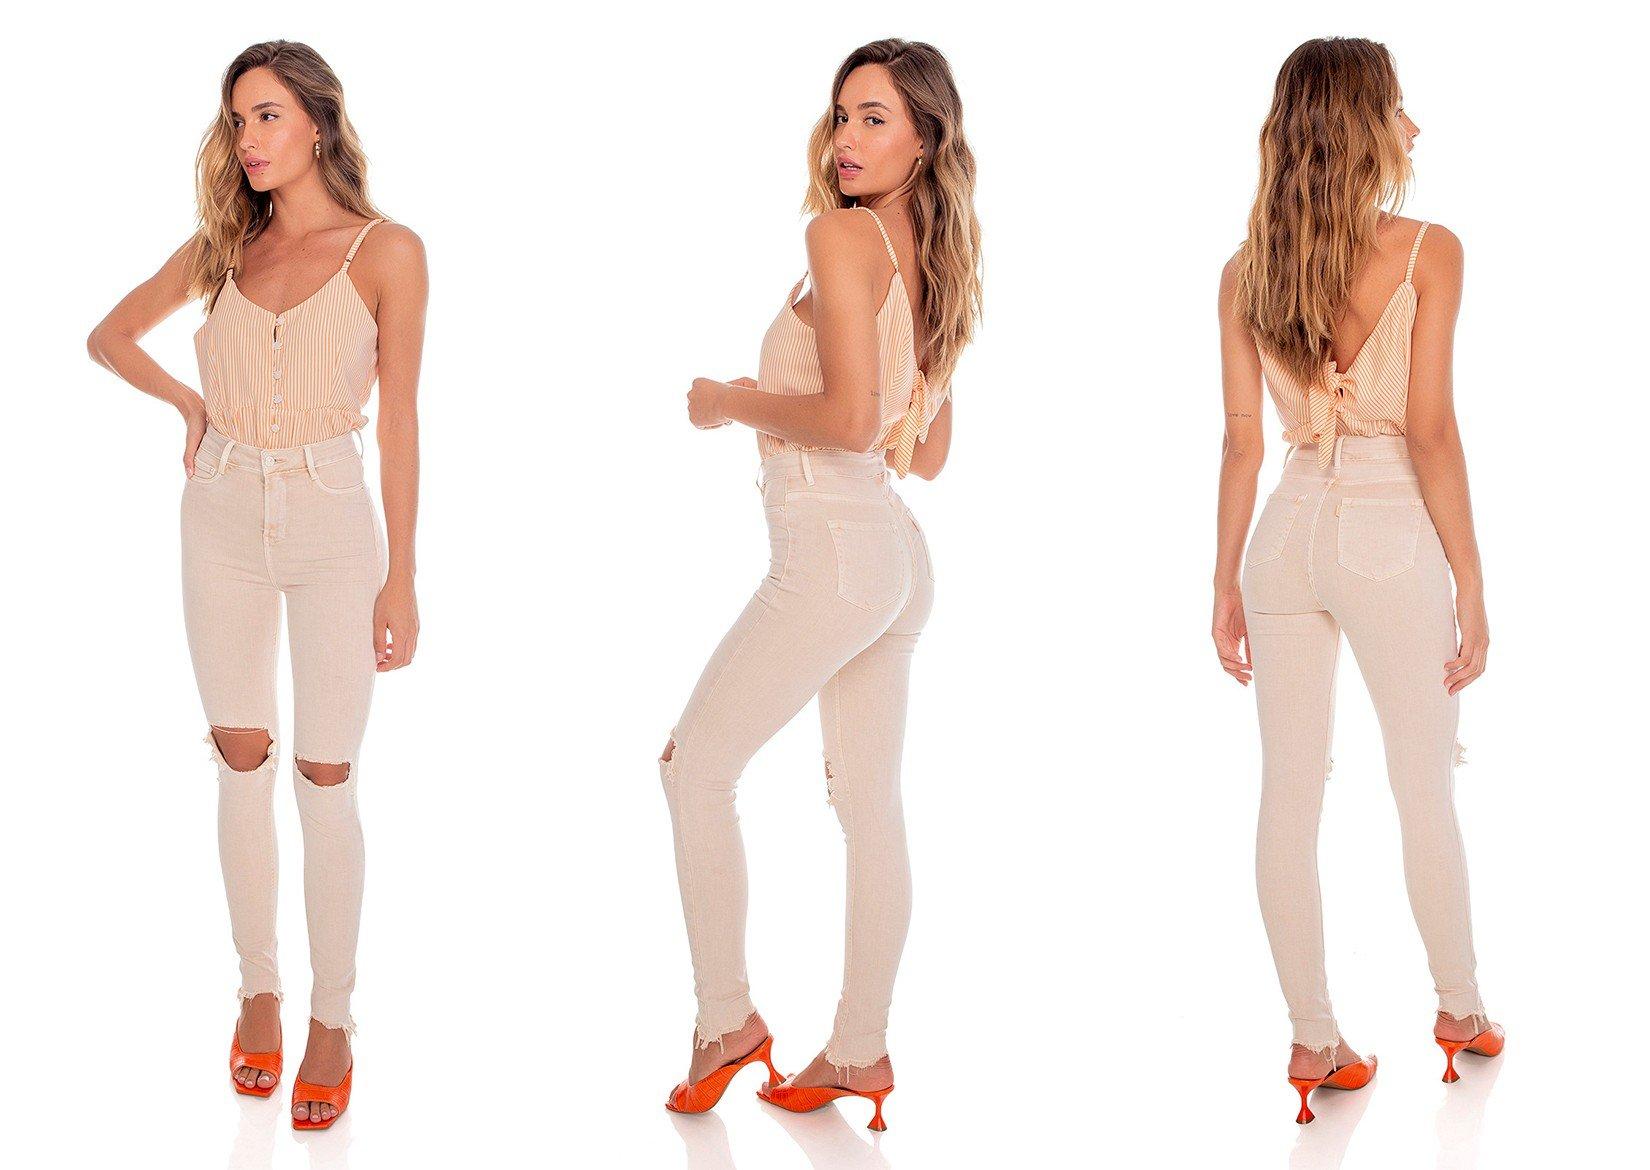 dz3573 re calca jeans feminina skinny hot pants colorida natural denim zero tripla